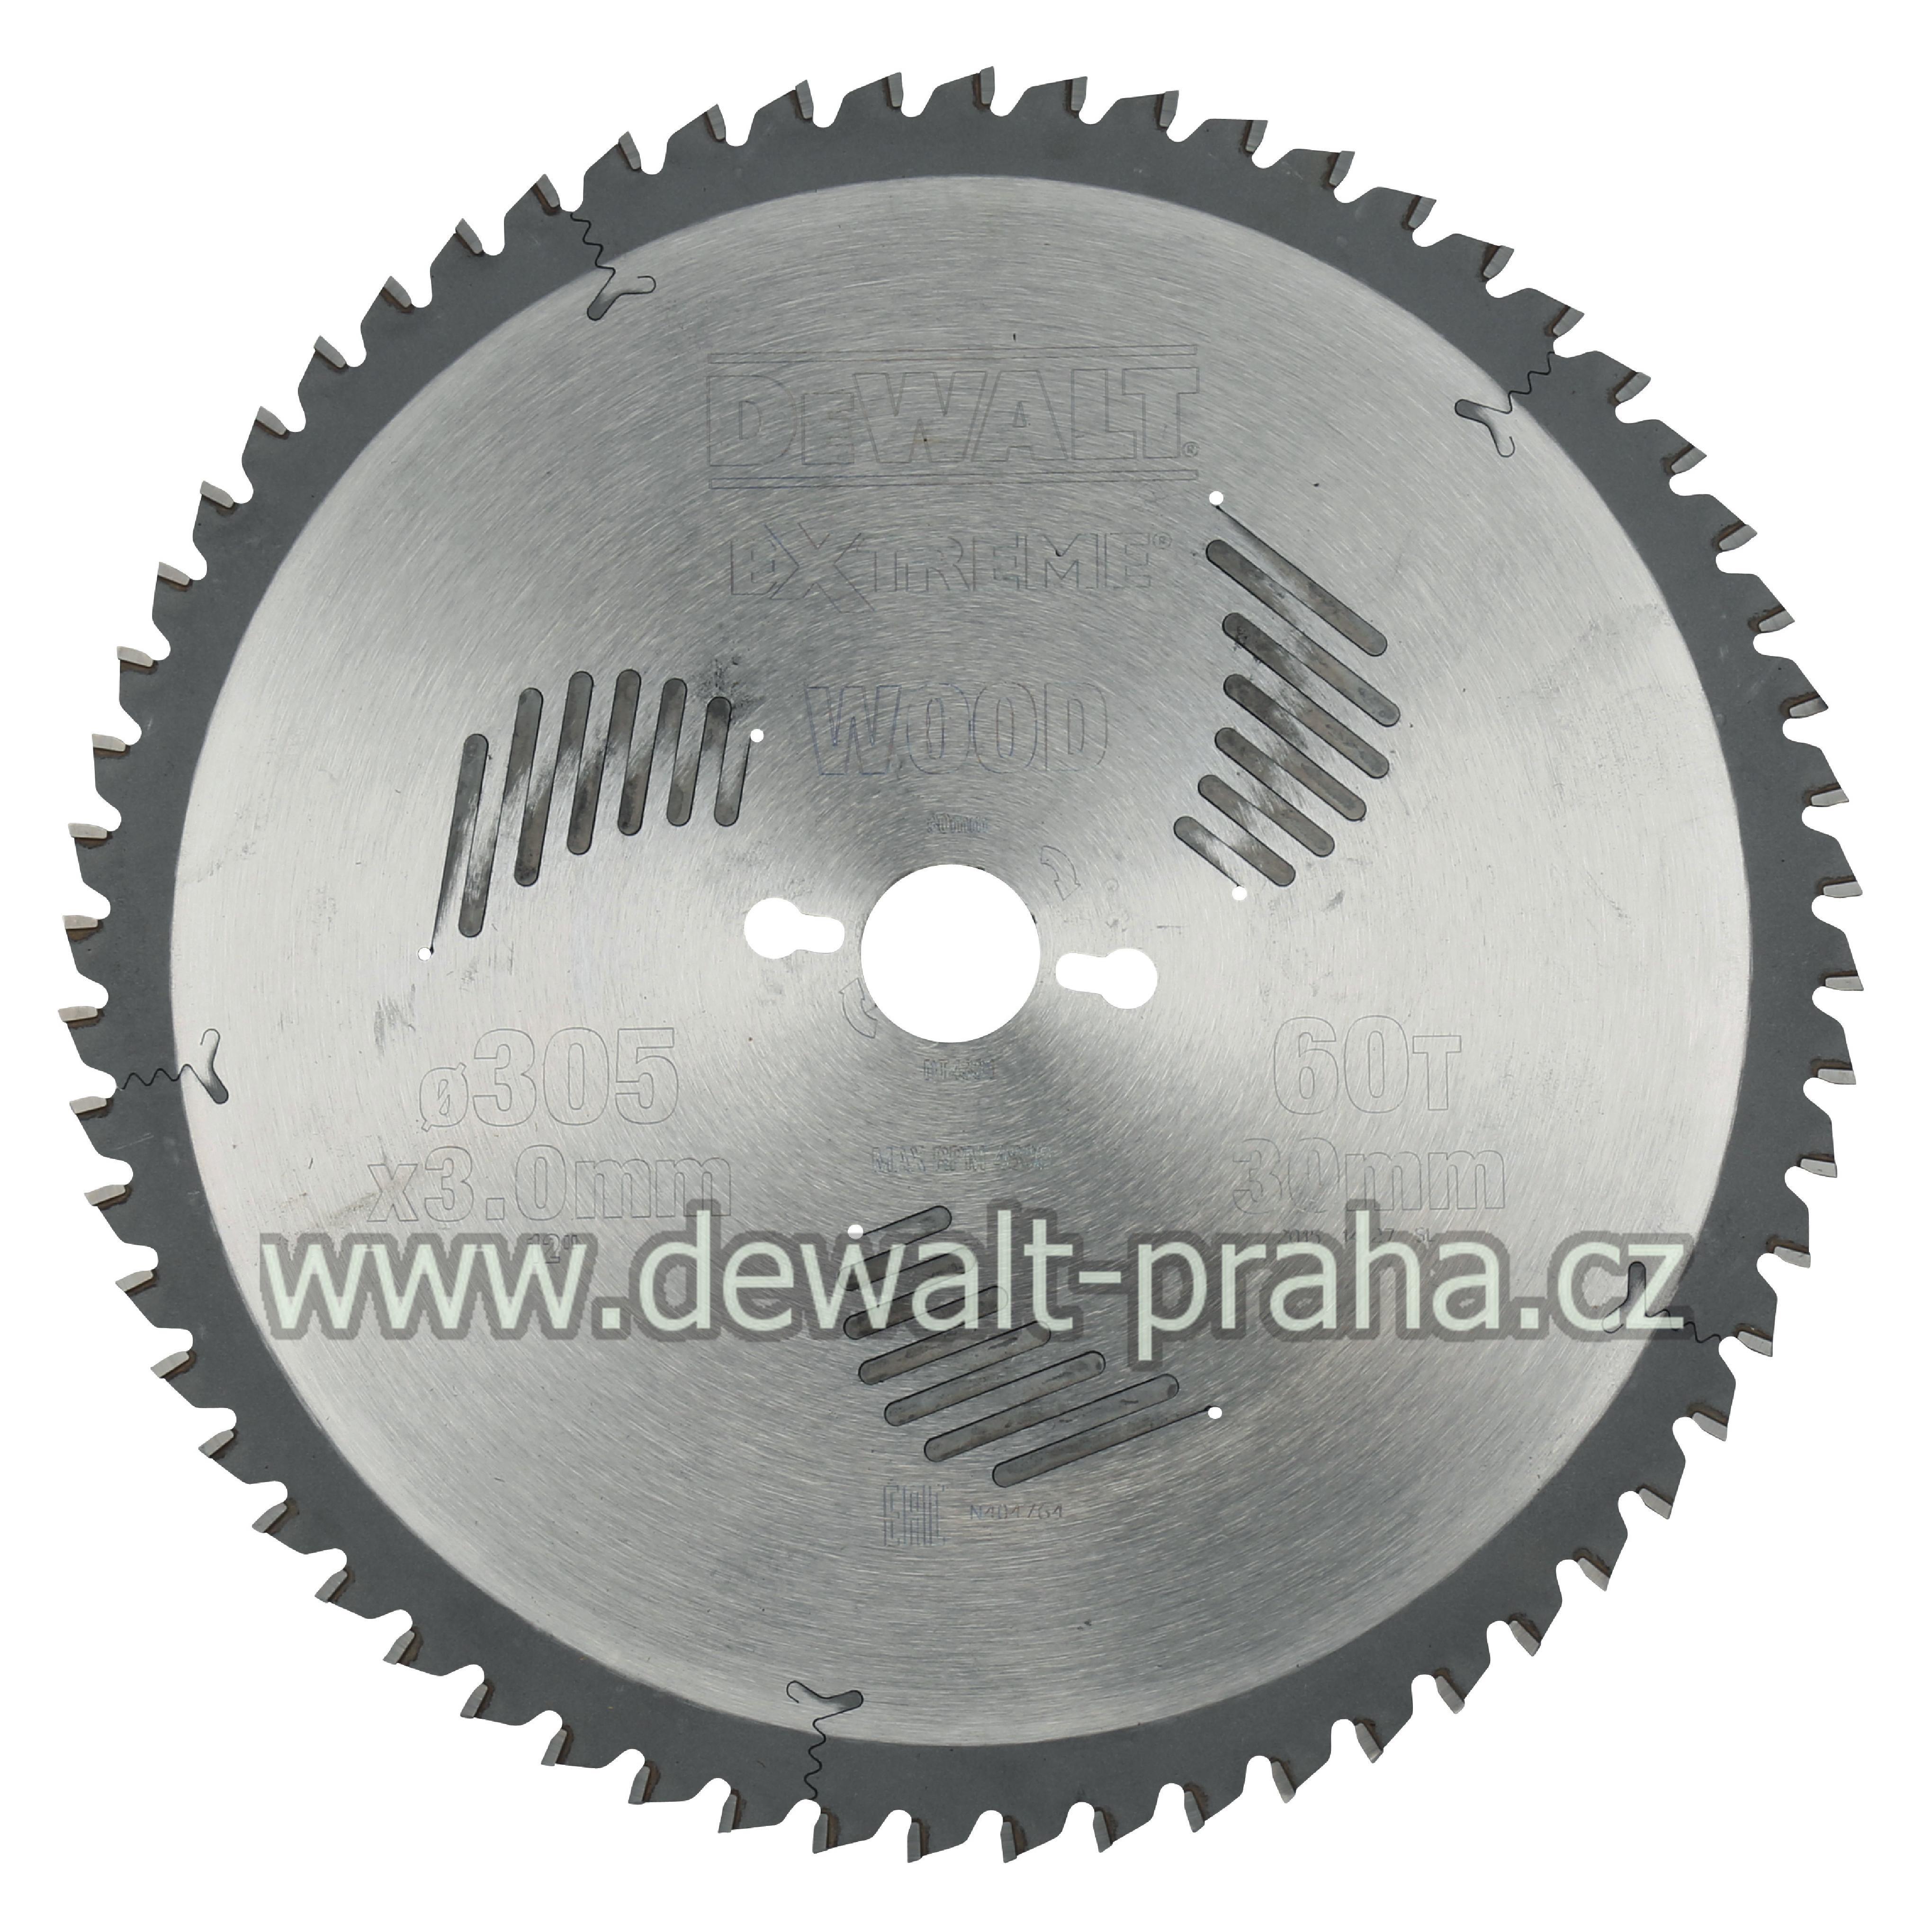 DT4331 DeWALT Pilový kotouč 305x30mm, 60 zubů